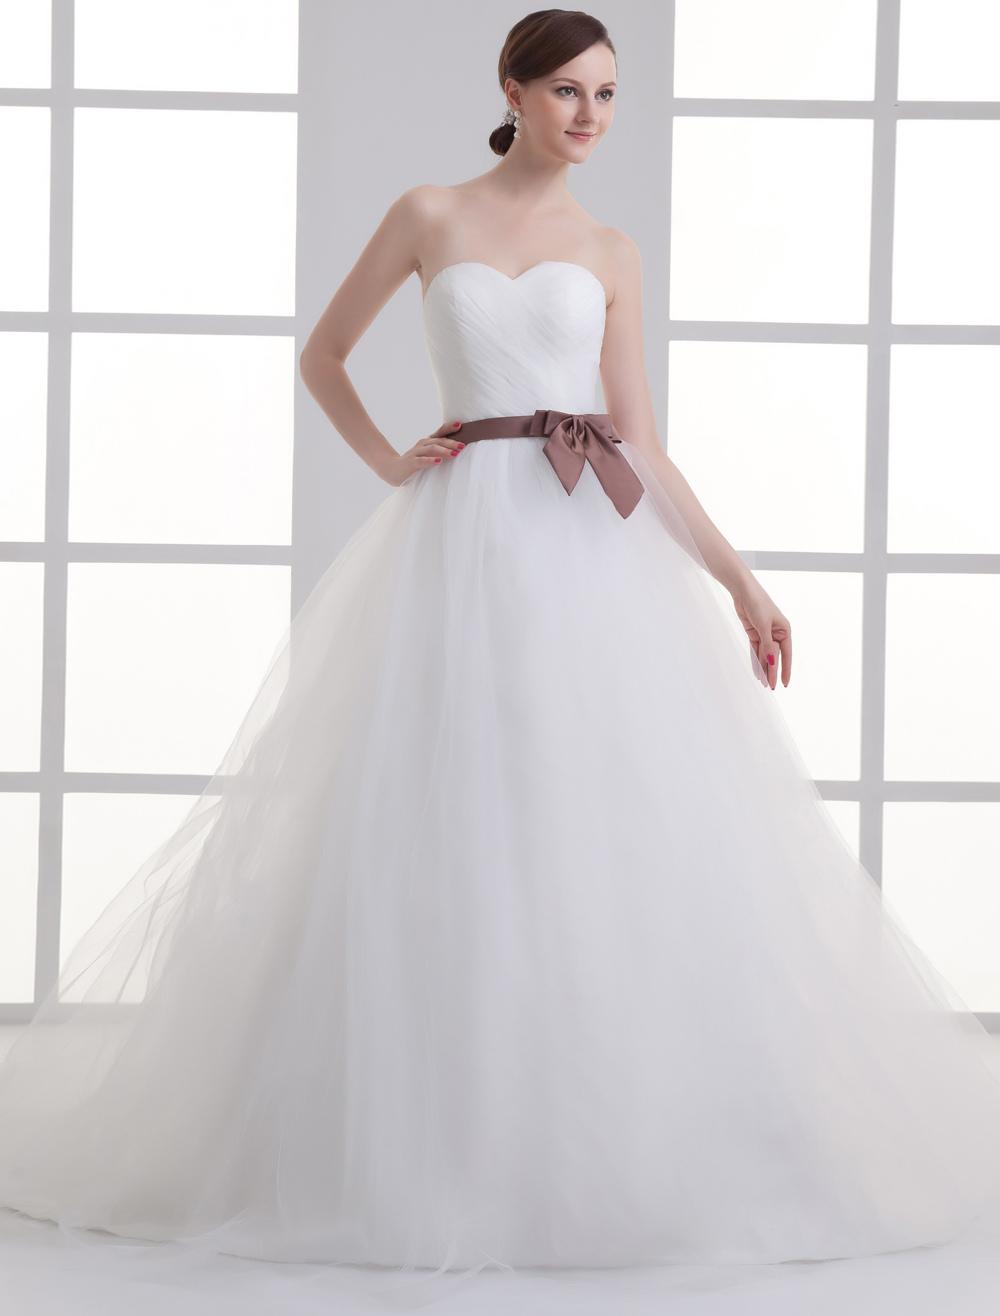 Sweetheart Neck Strapless Sash Net Bridal Wedding Gown